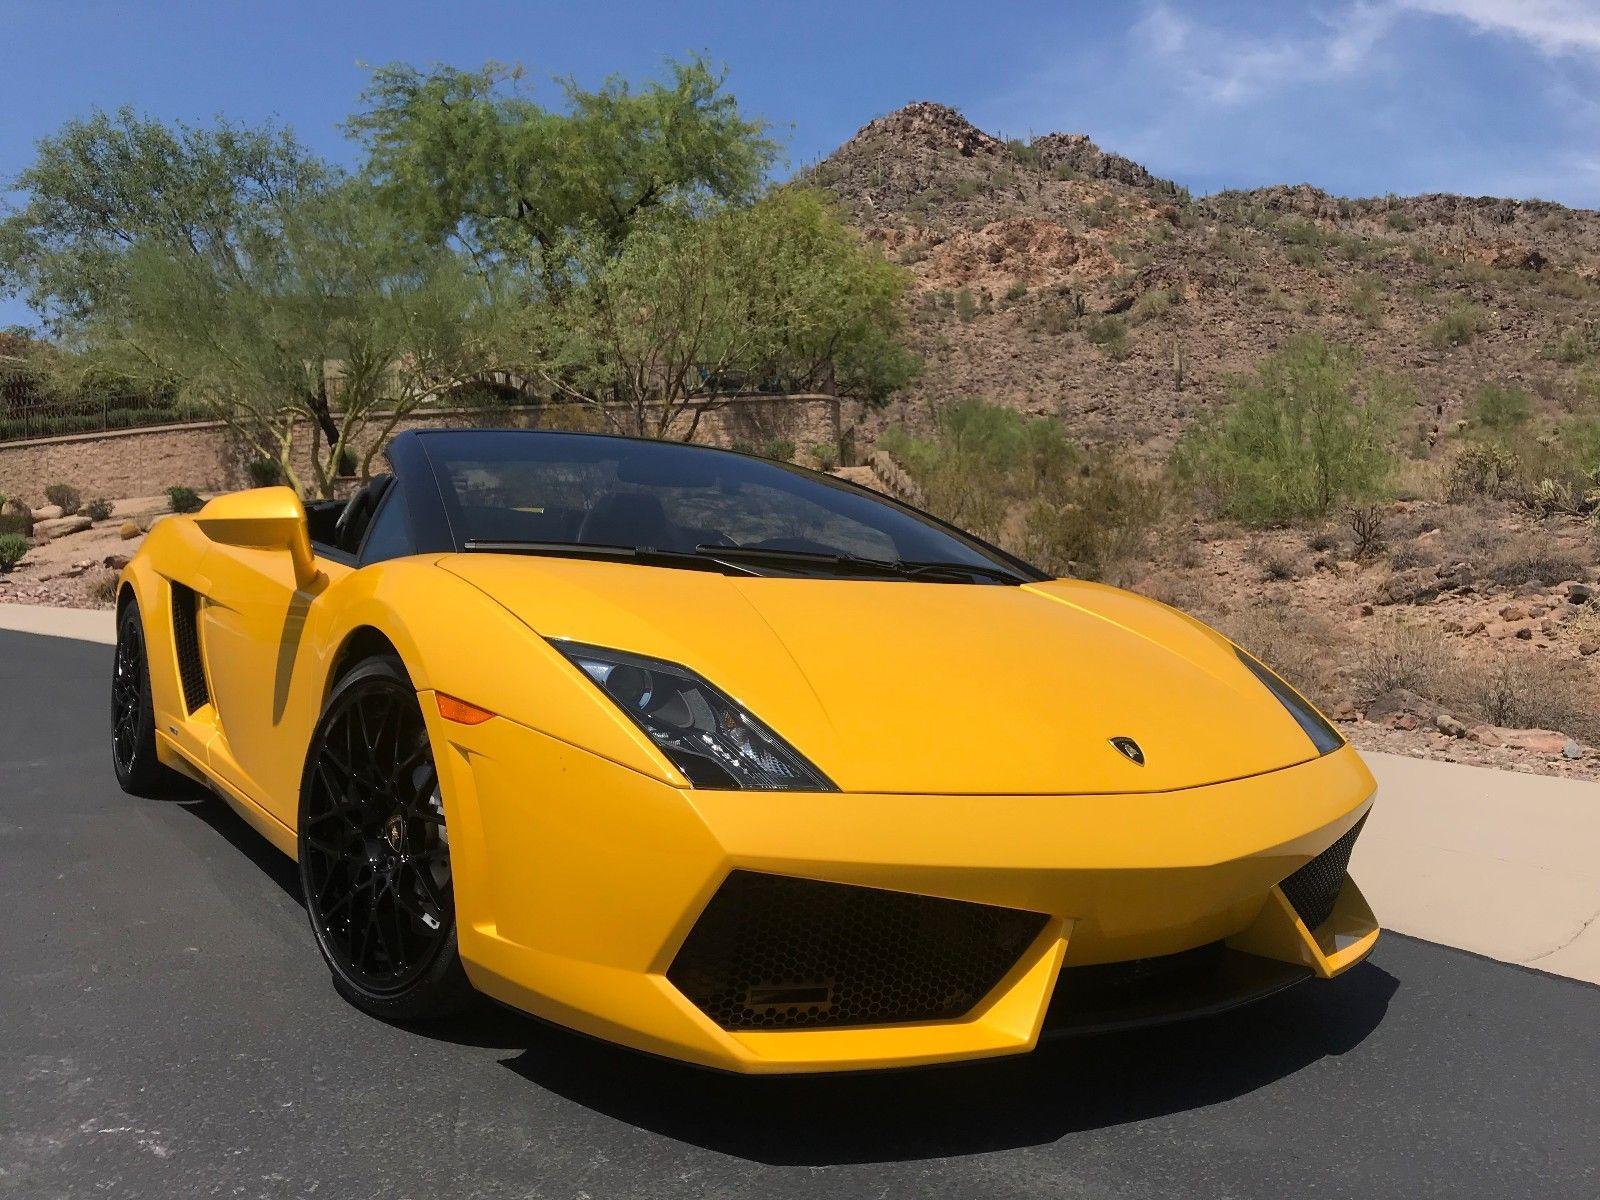 Amazing 2010 Lamborghini Gallardo Gallardo Lp560 4 Spyder Loaded